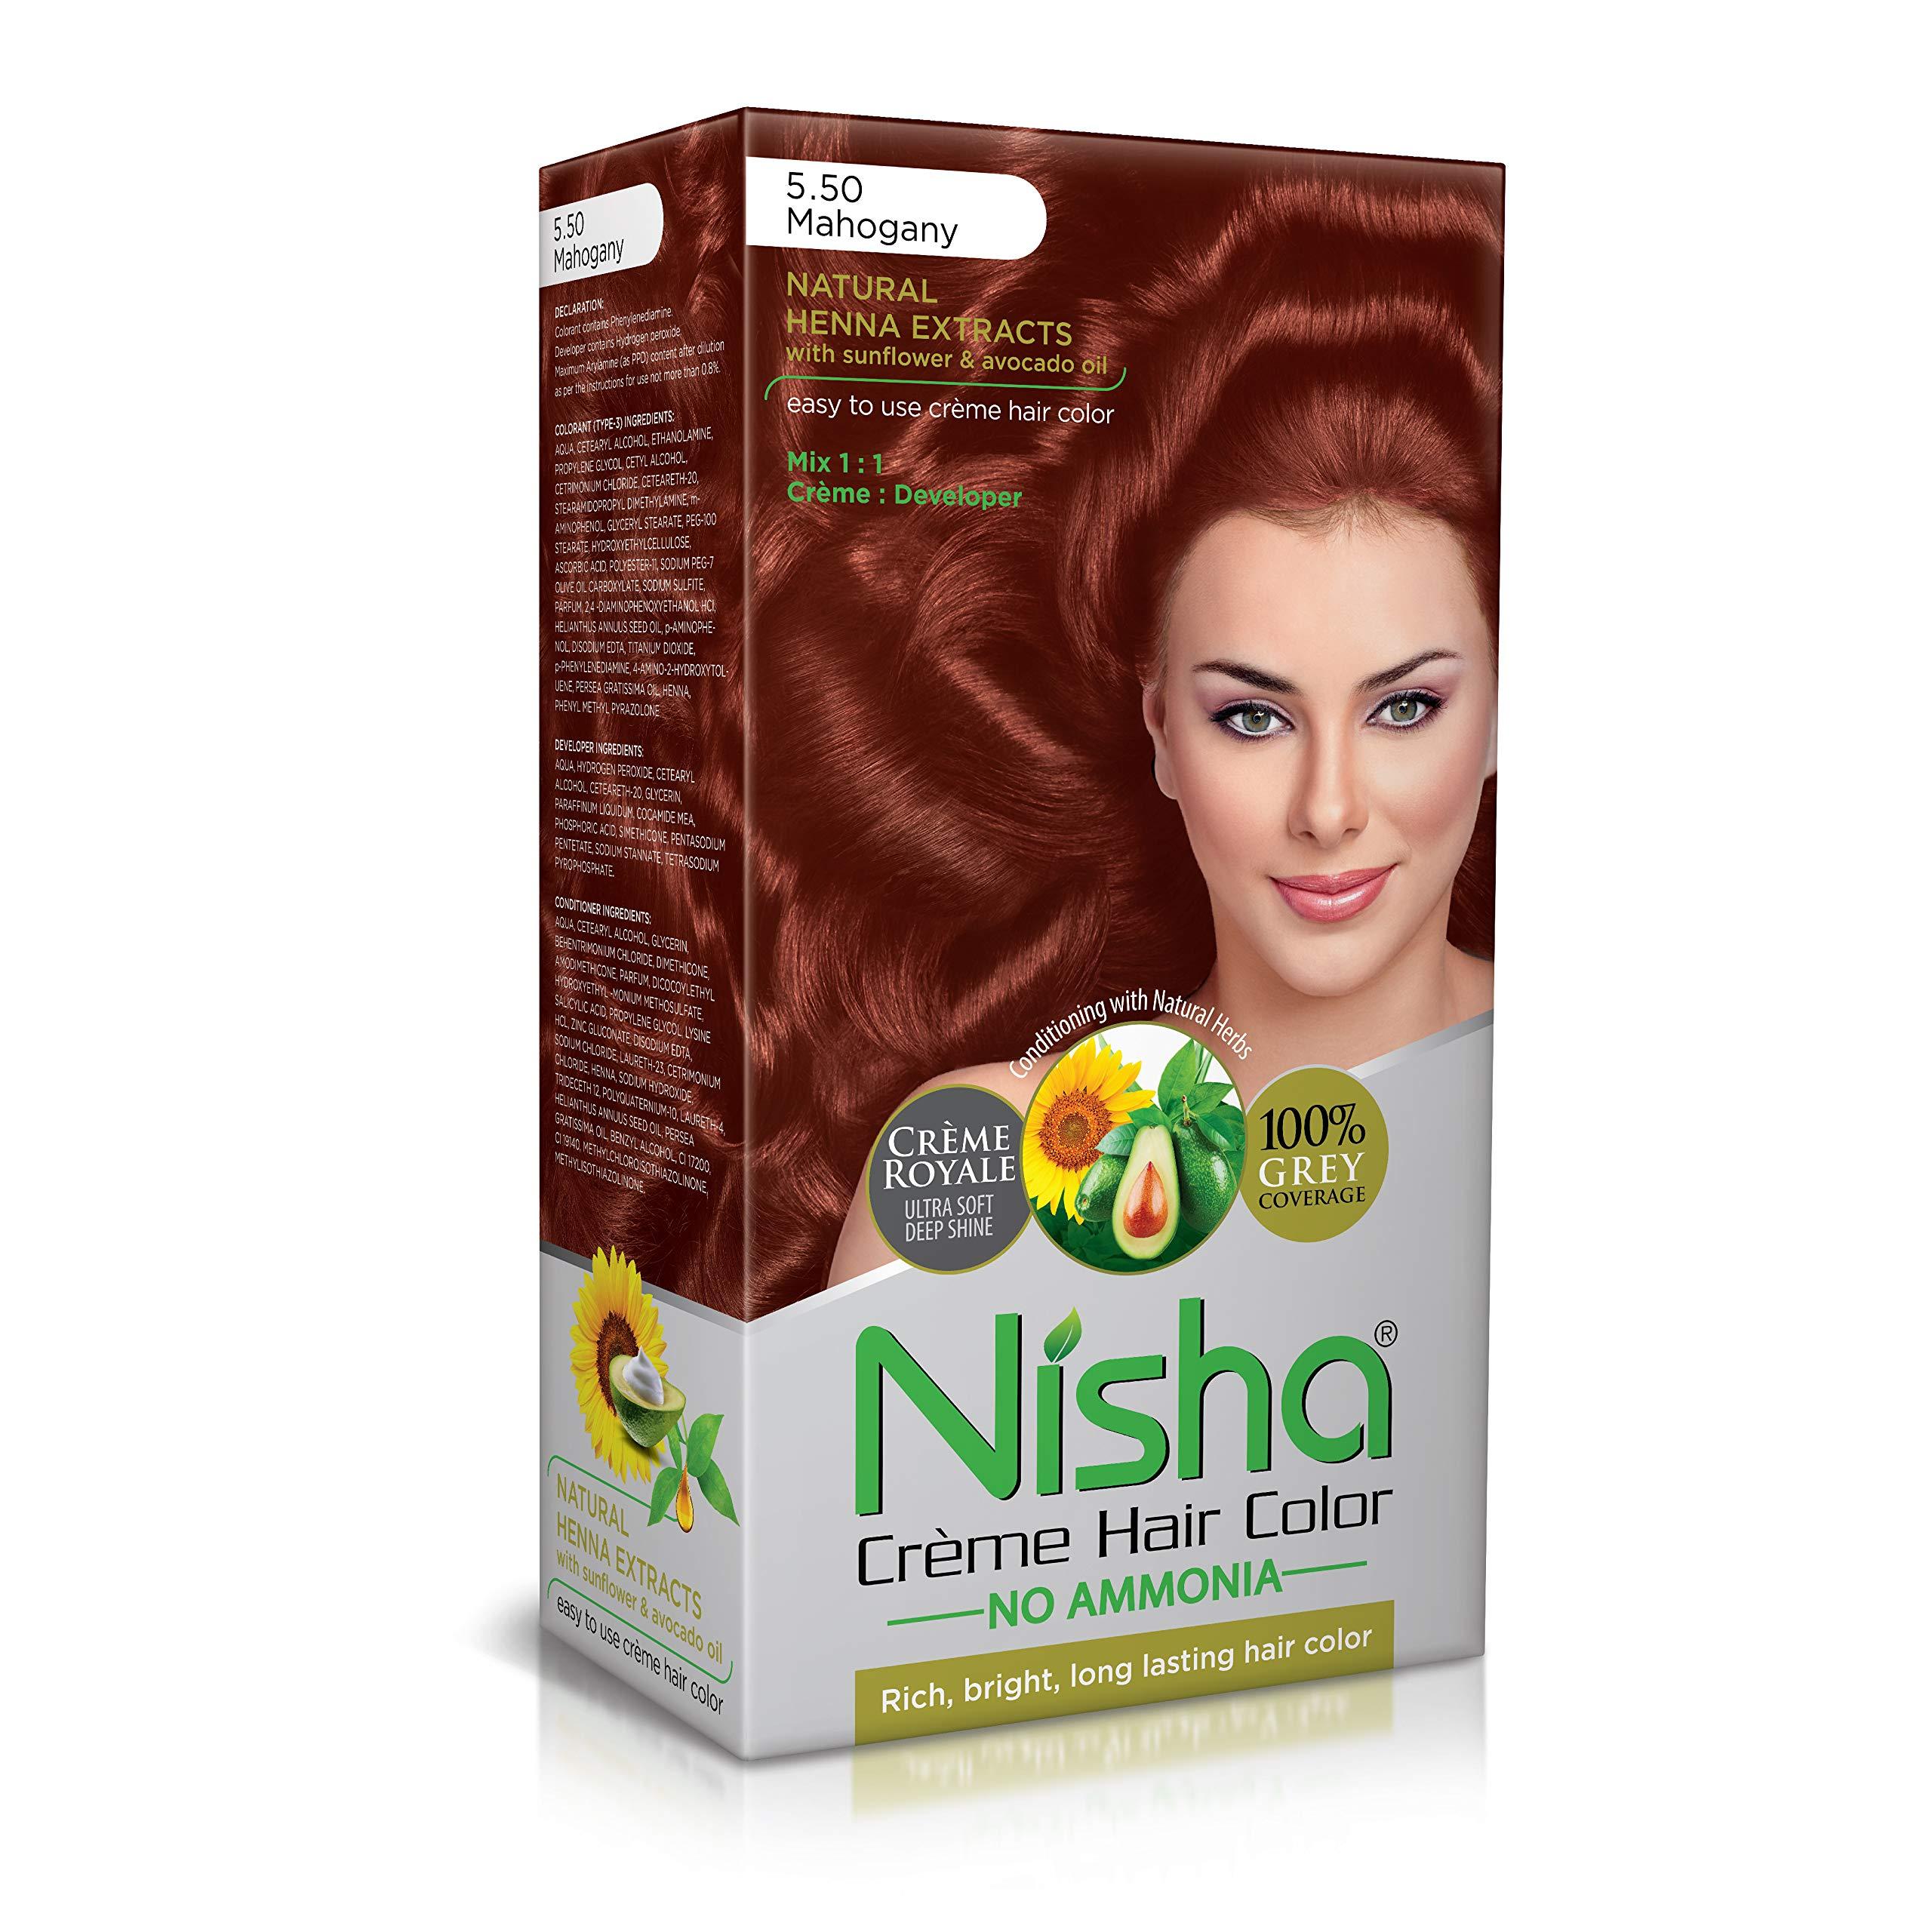 Nisha cream hair color superior quality no ammonia cream formula permanent Fashion Highlights and rich bright long-lasting colour Mahogany (pack of 1) by Nisha